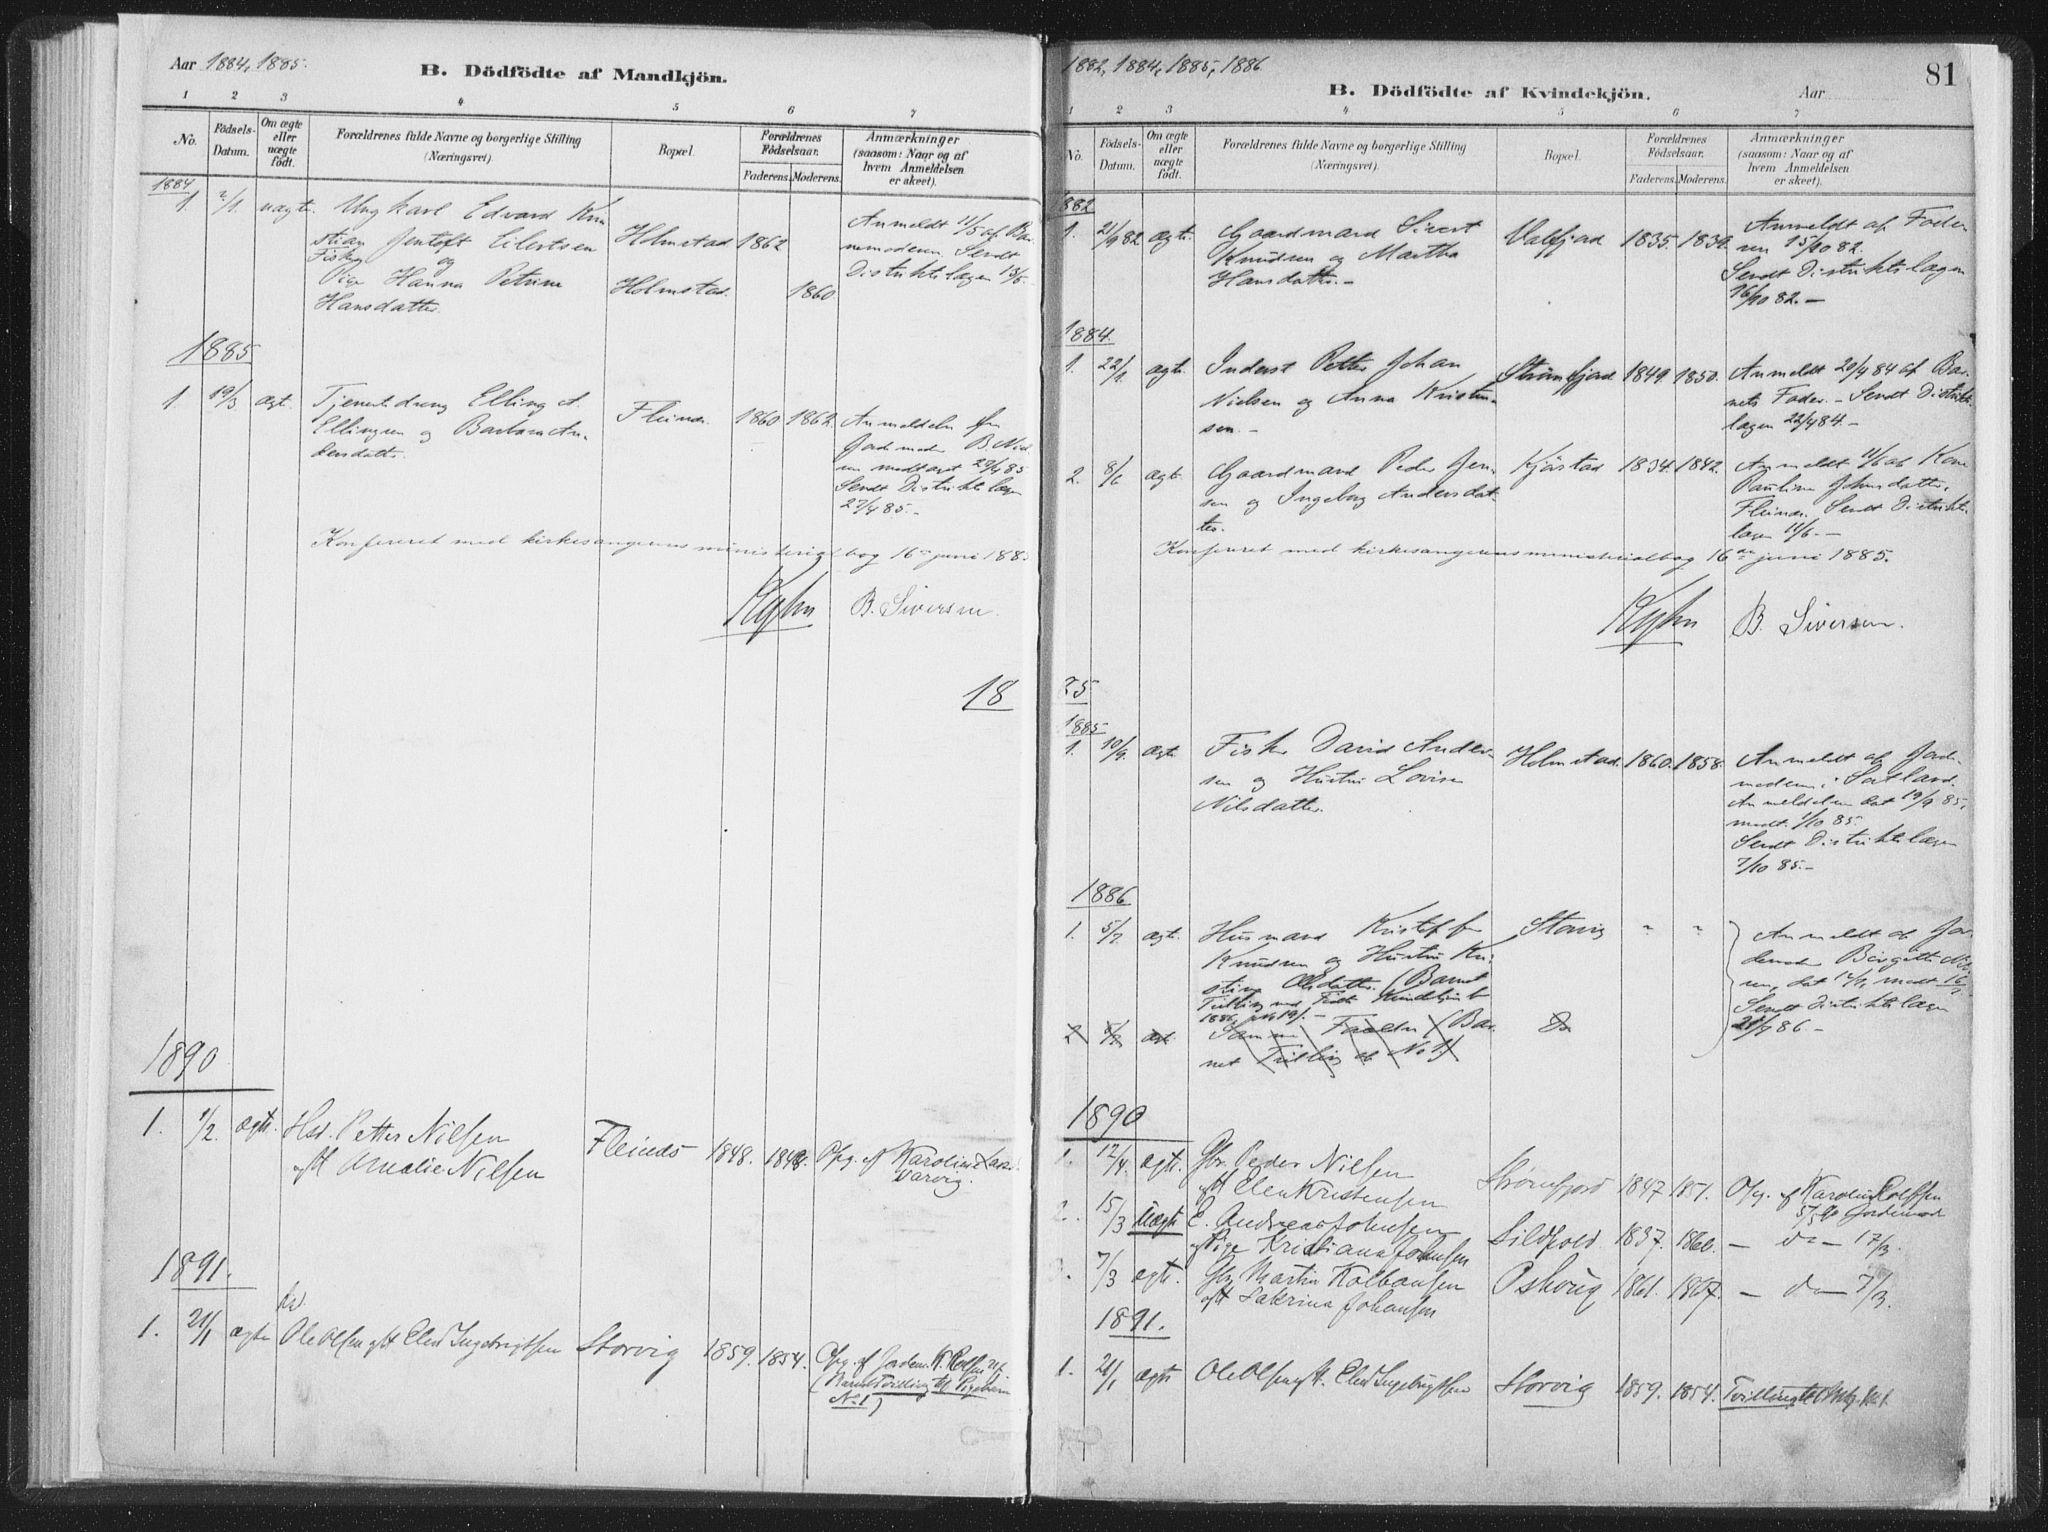 SAT, Ministerialprotokoller, klokkerbøker og fødselsregistre - Nordland, 890/L1286: Ministerialbok nr. 890A01, 1882-1902, s. 81